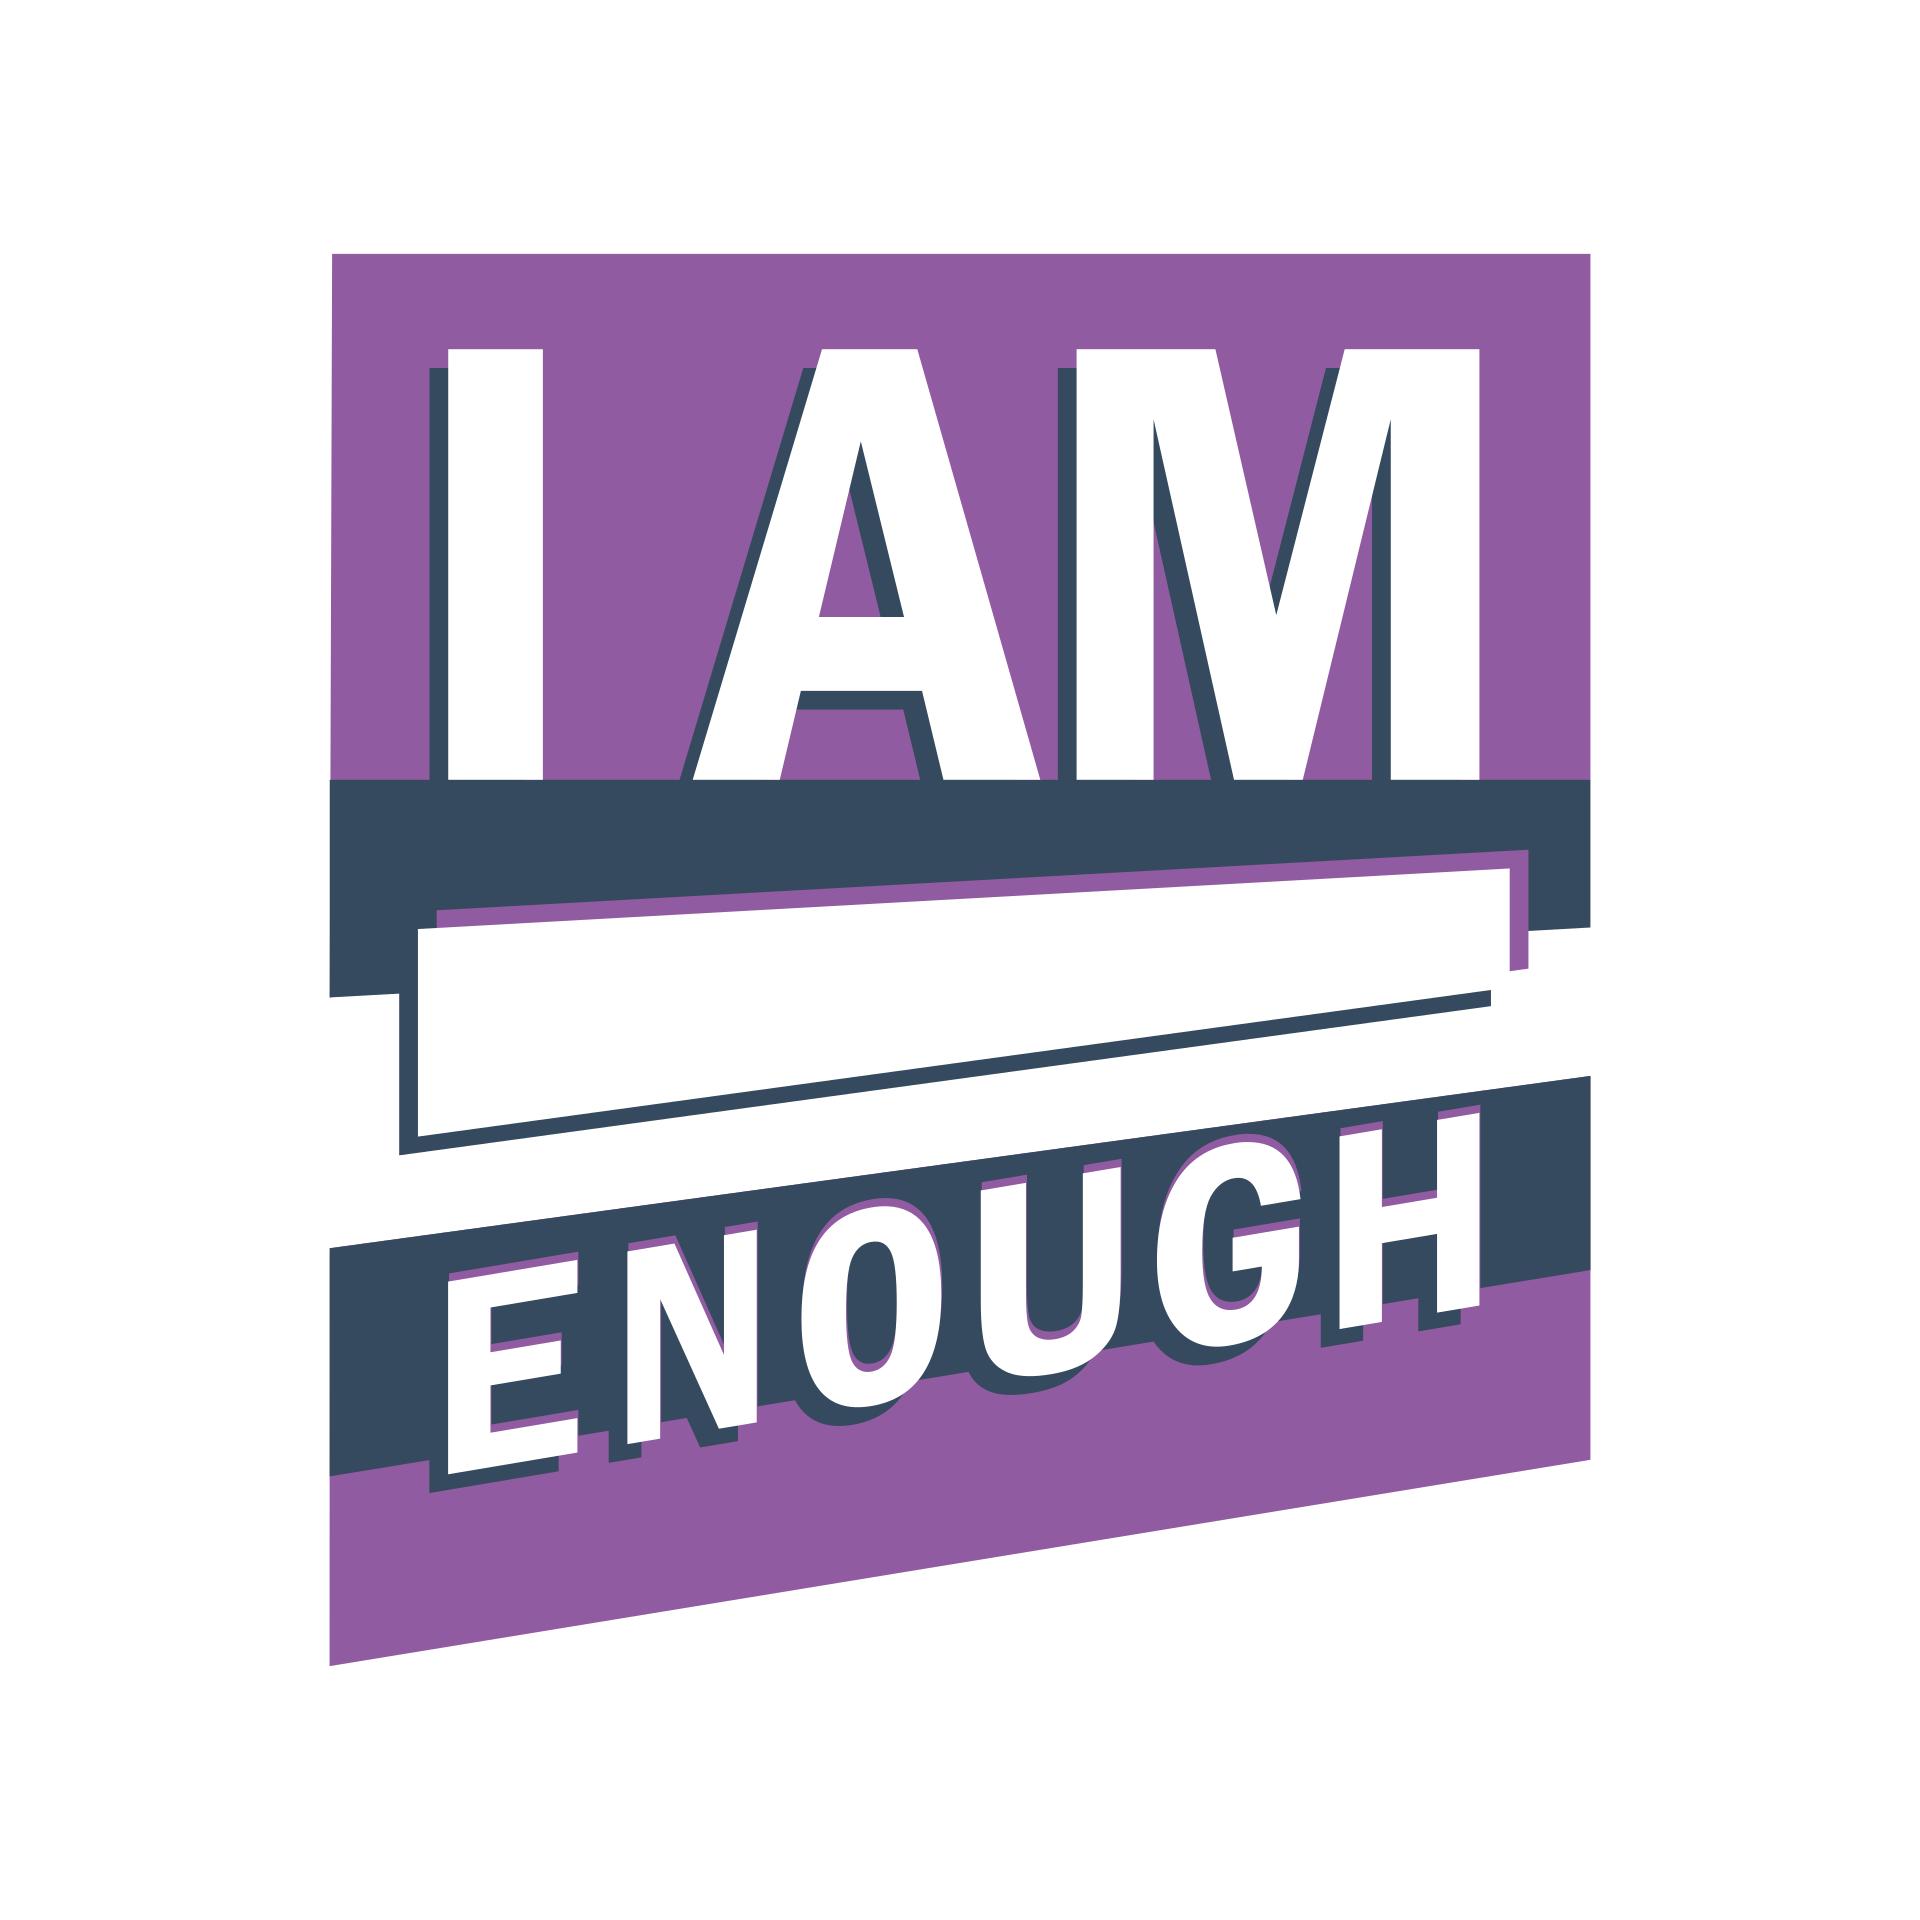 I am enough